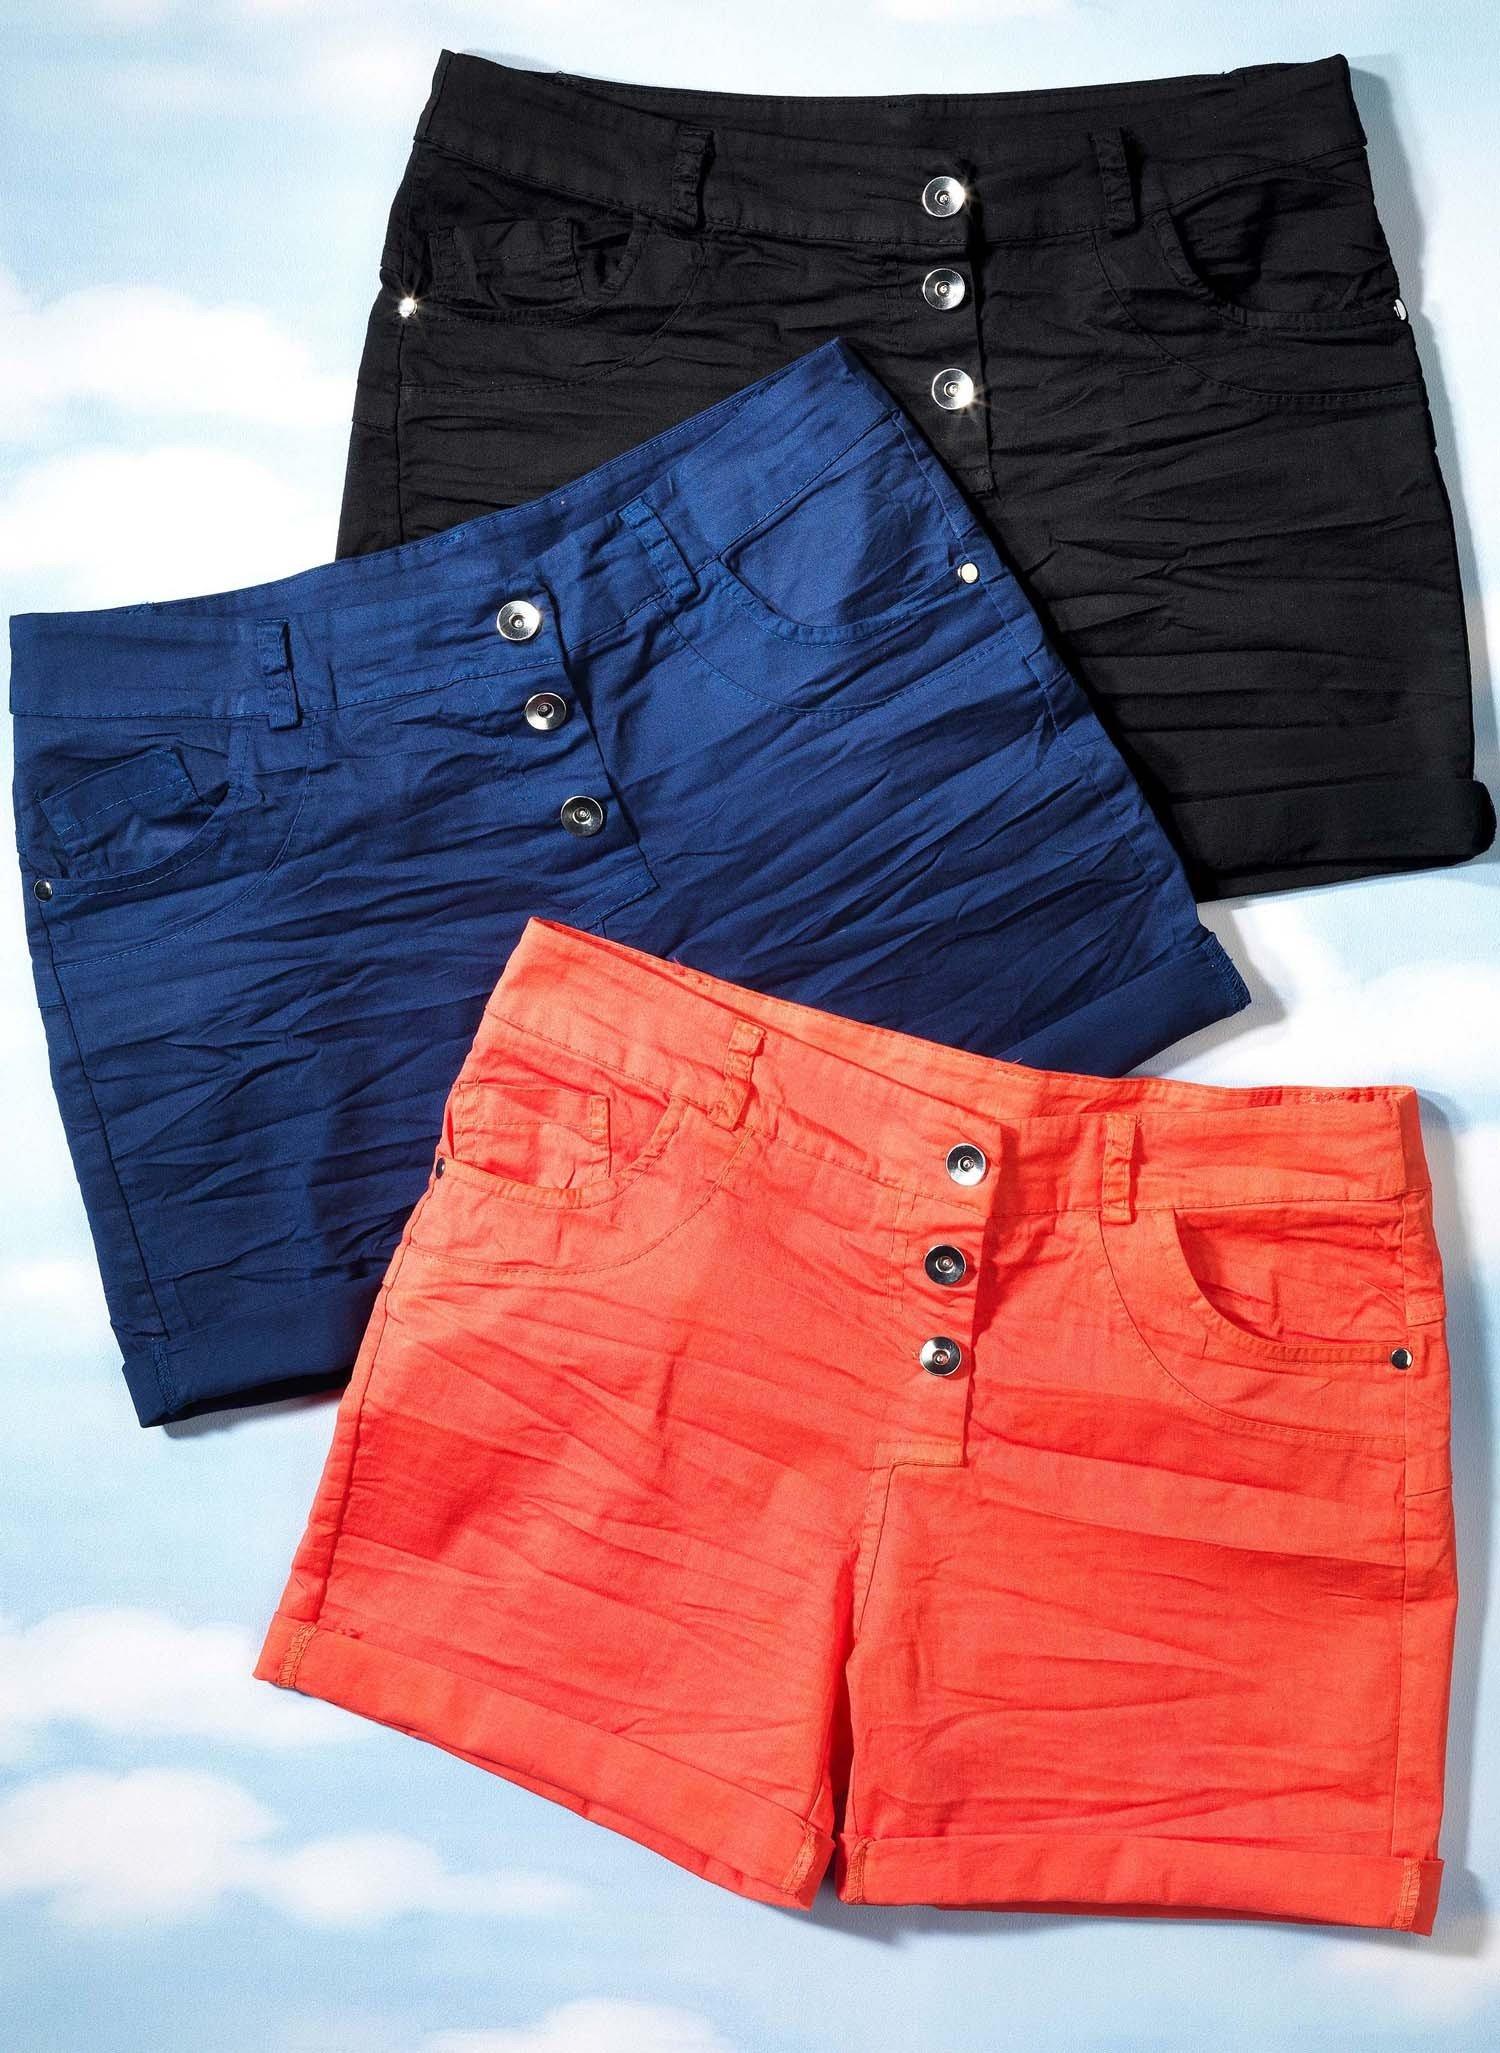 D-5-Pocket-Shorts schwarz L 010 - 2 - Ronja.ch